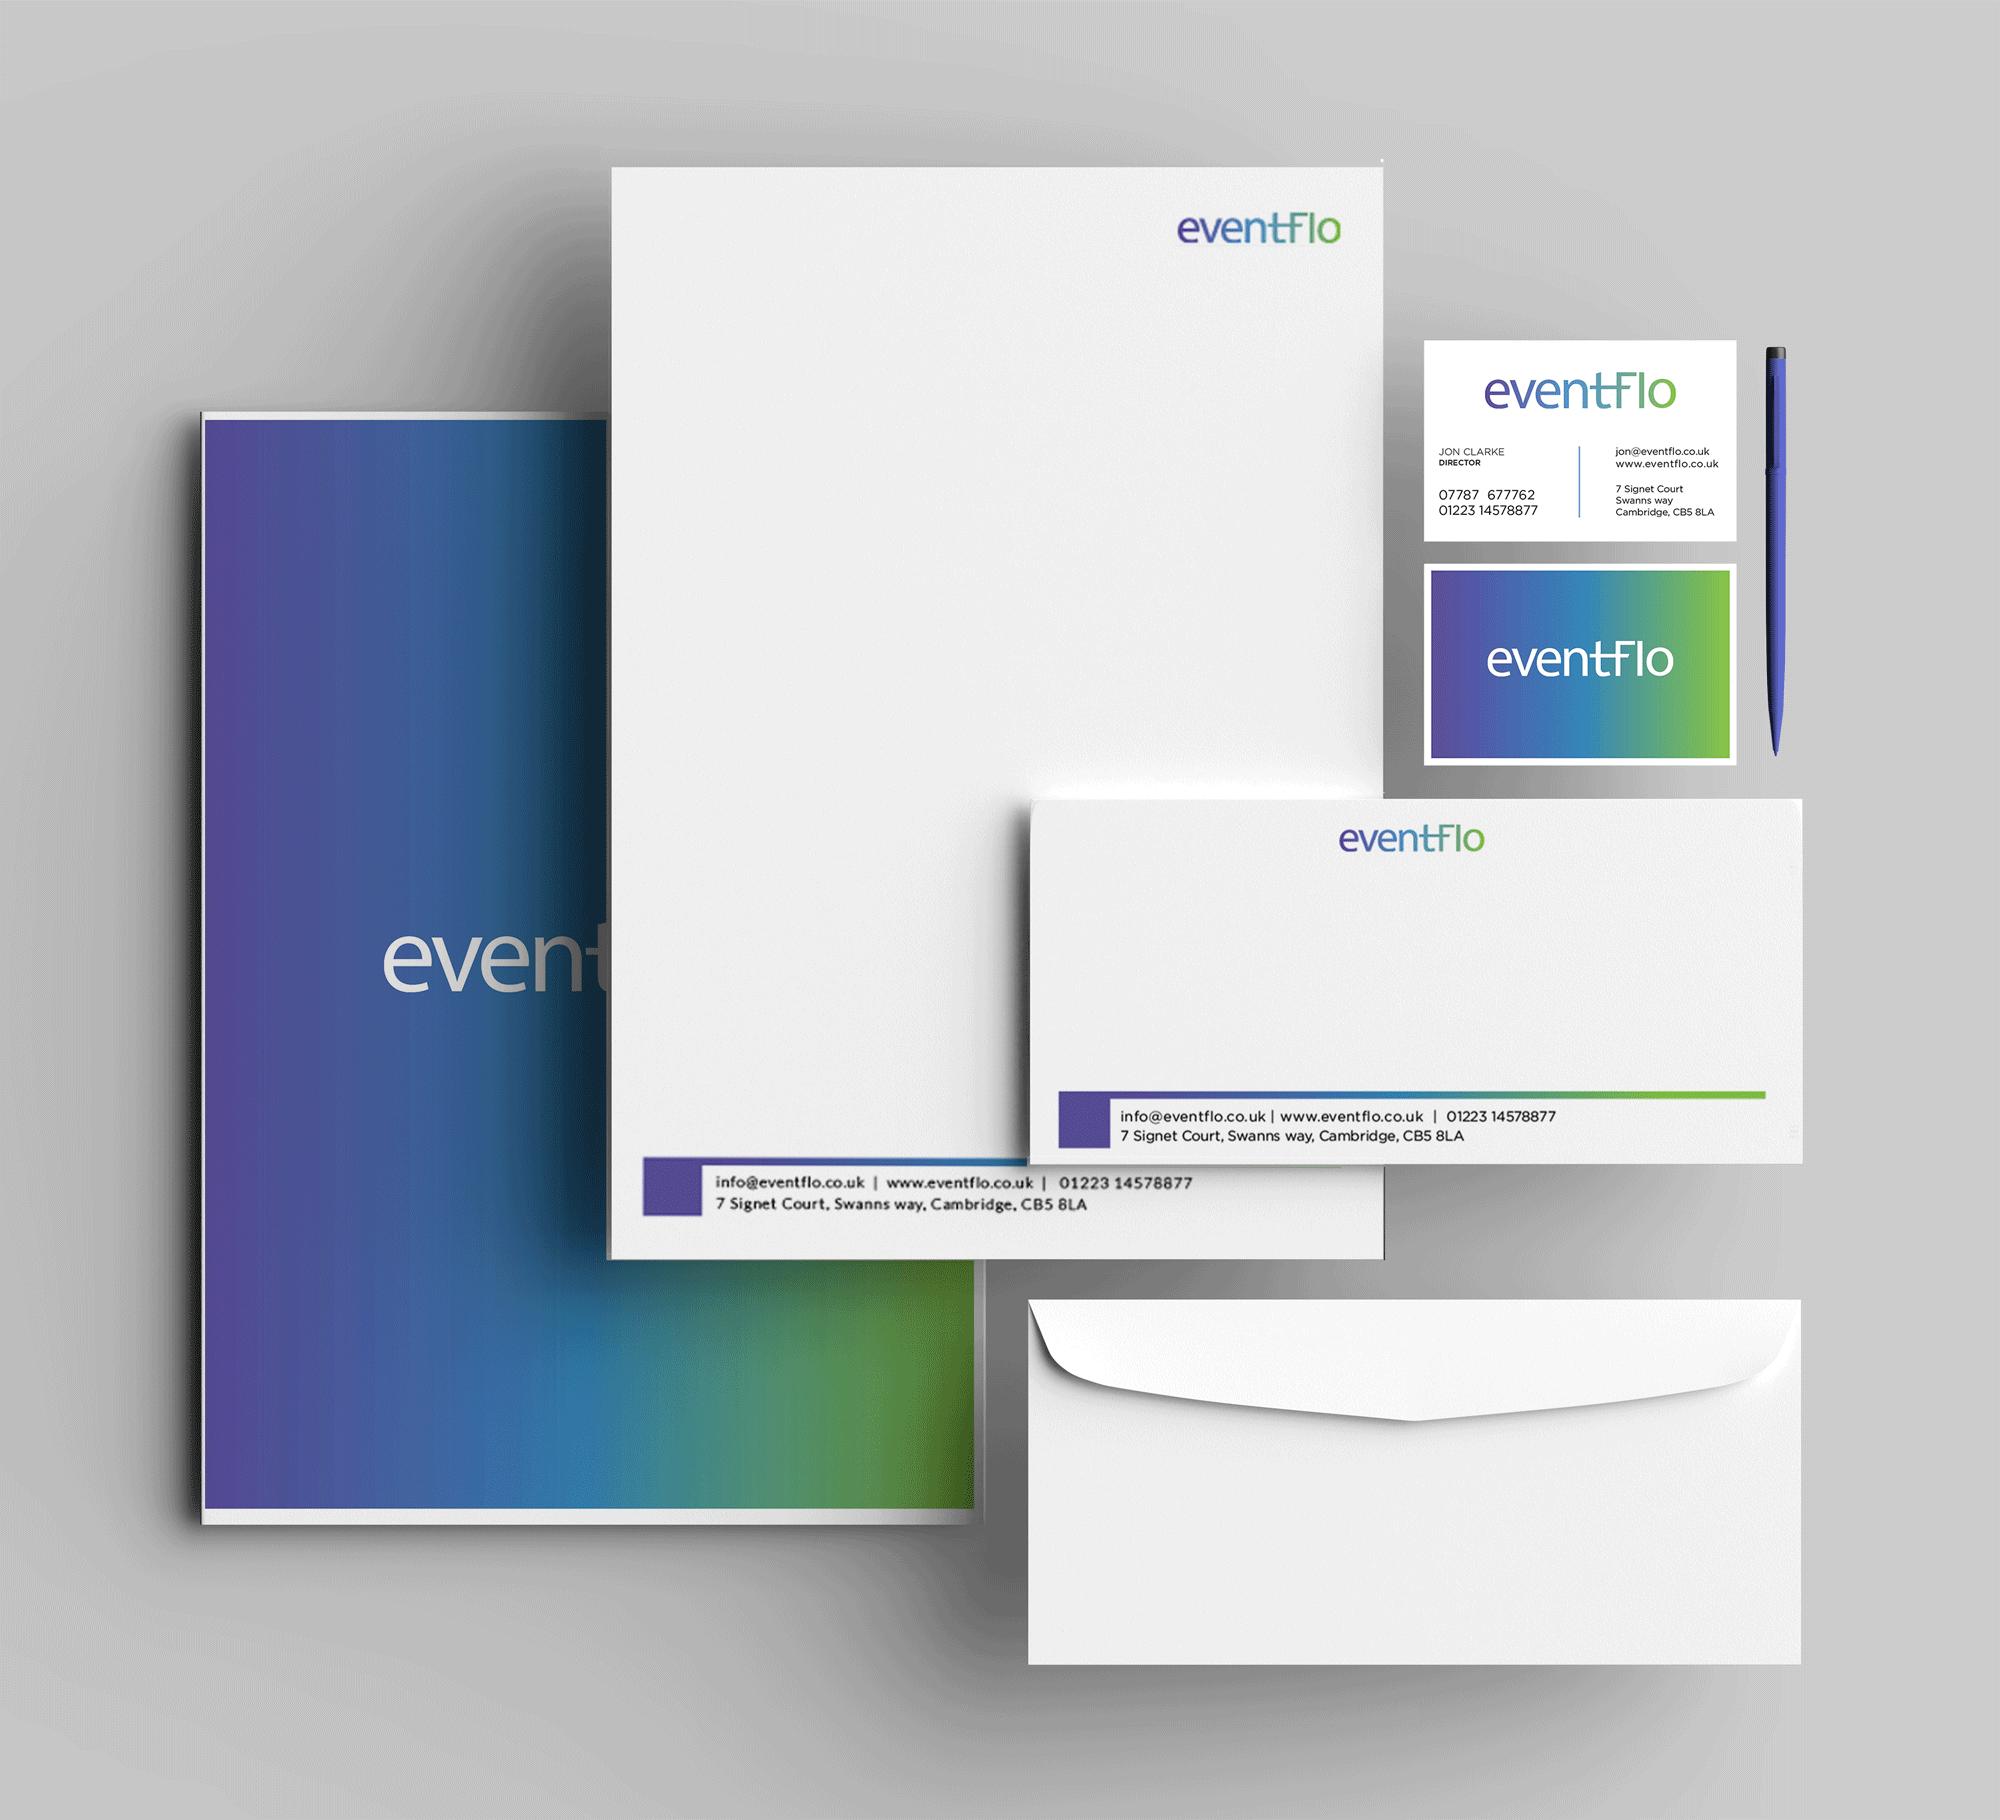 eventflo_stationery